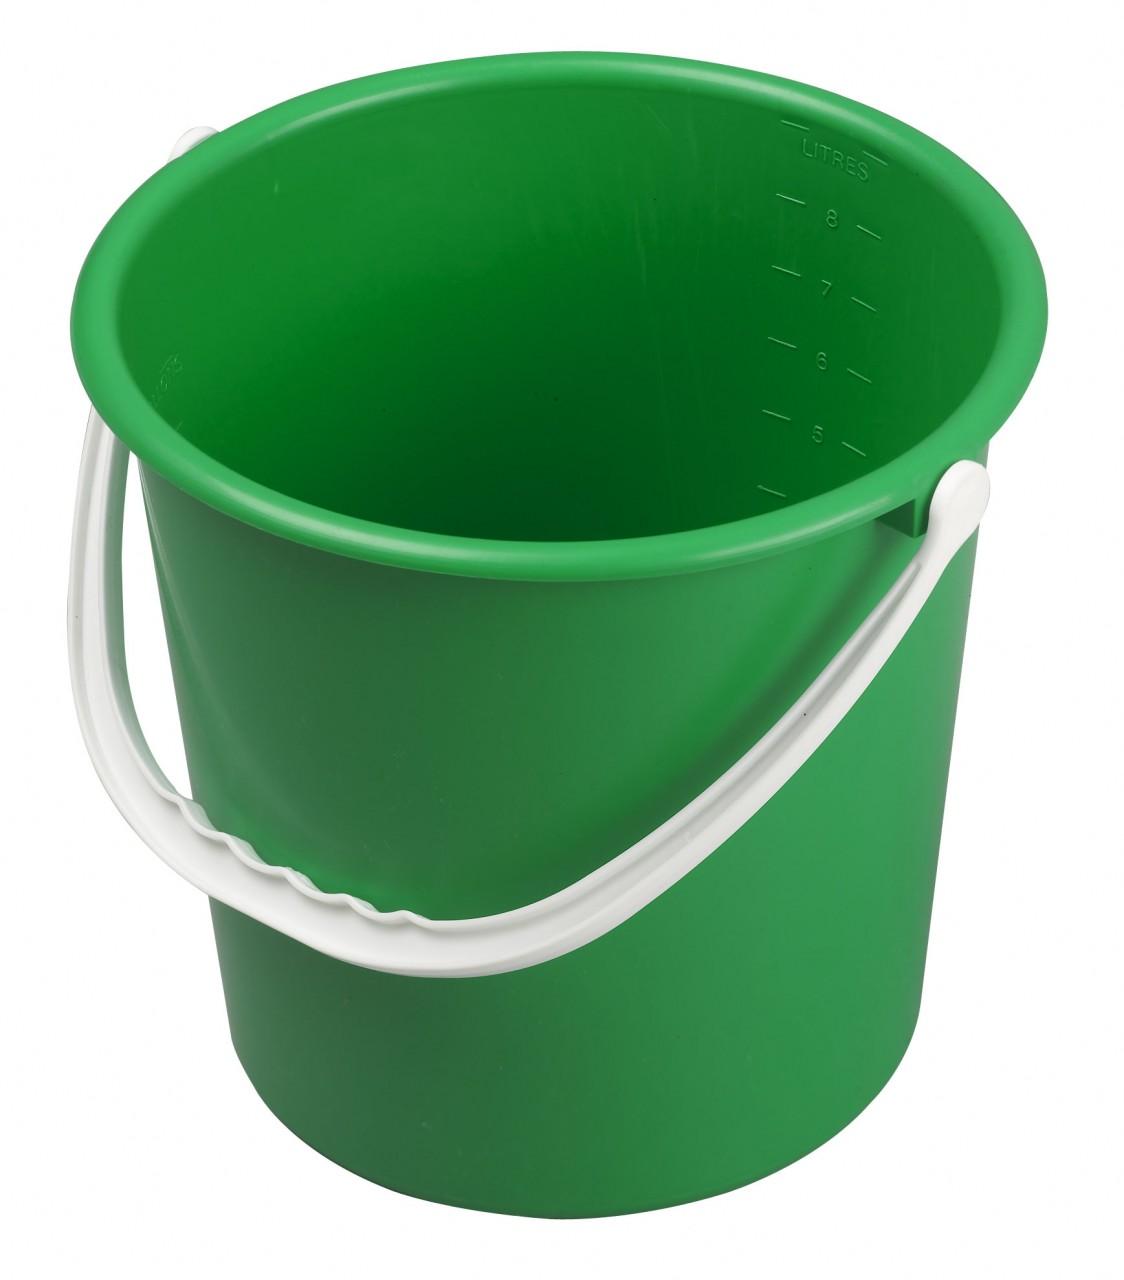 Buckets sahul trading corporation. Bucket clipart plastic bucket